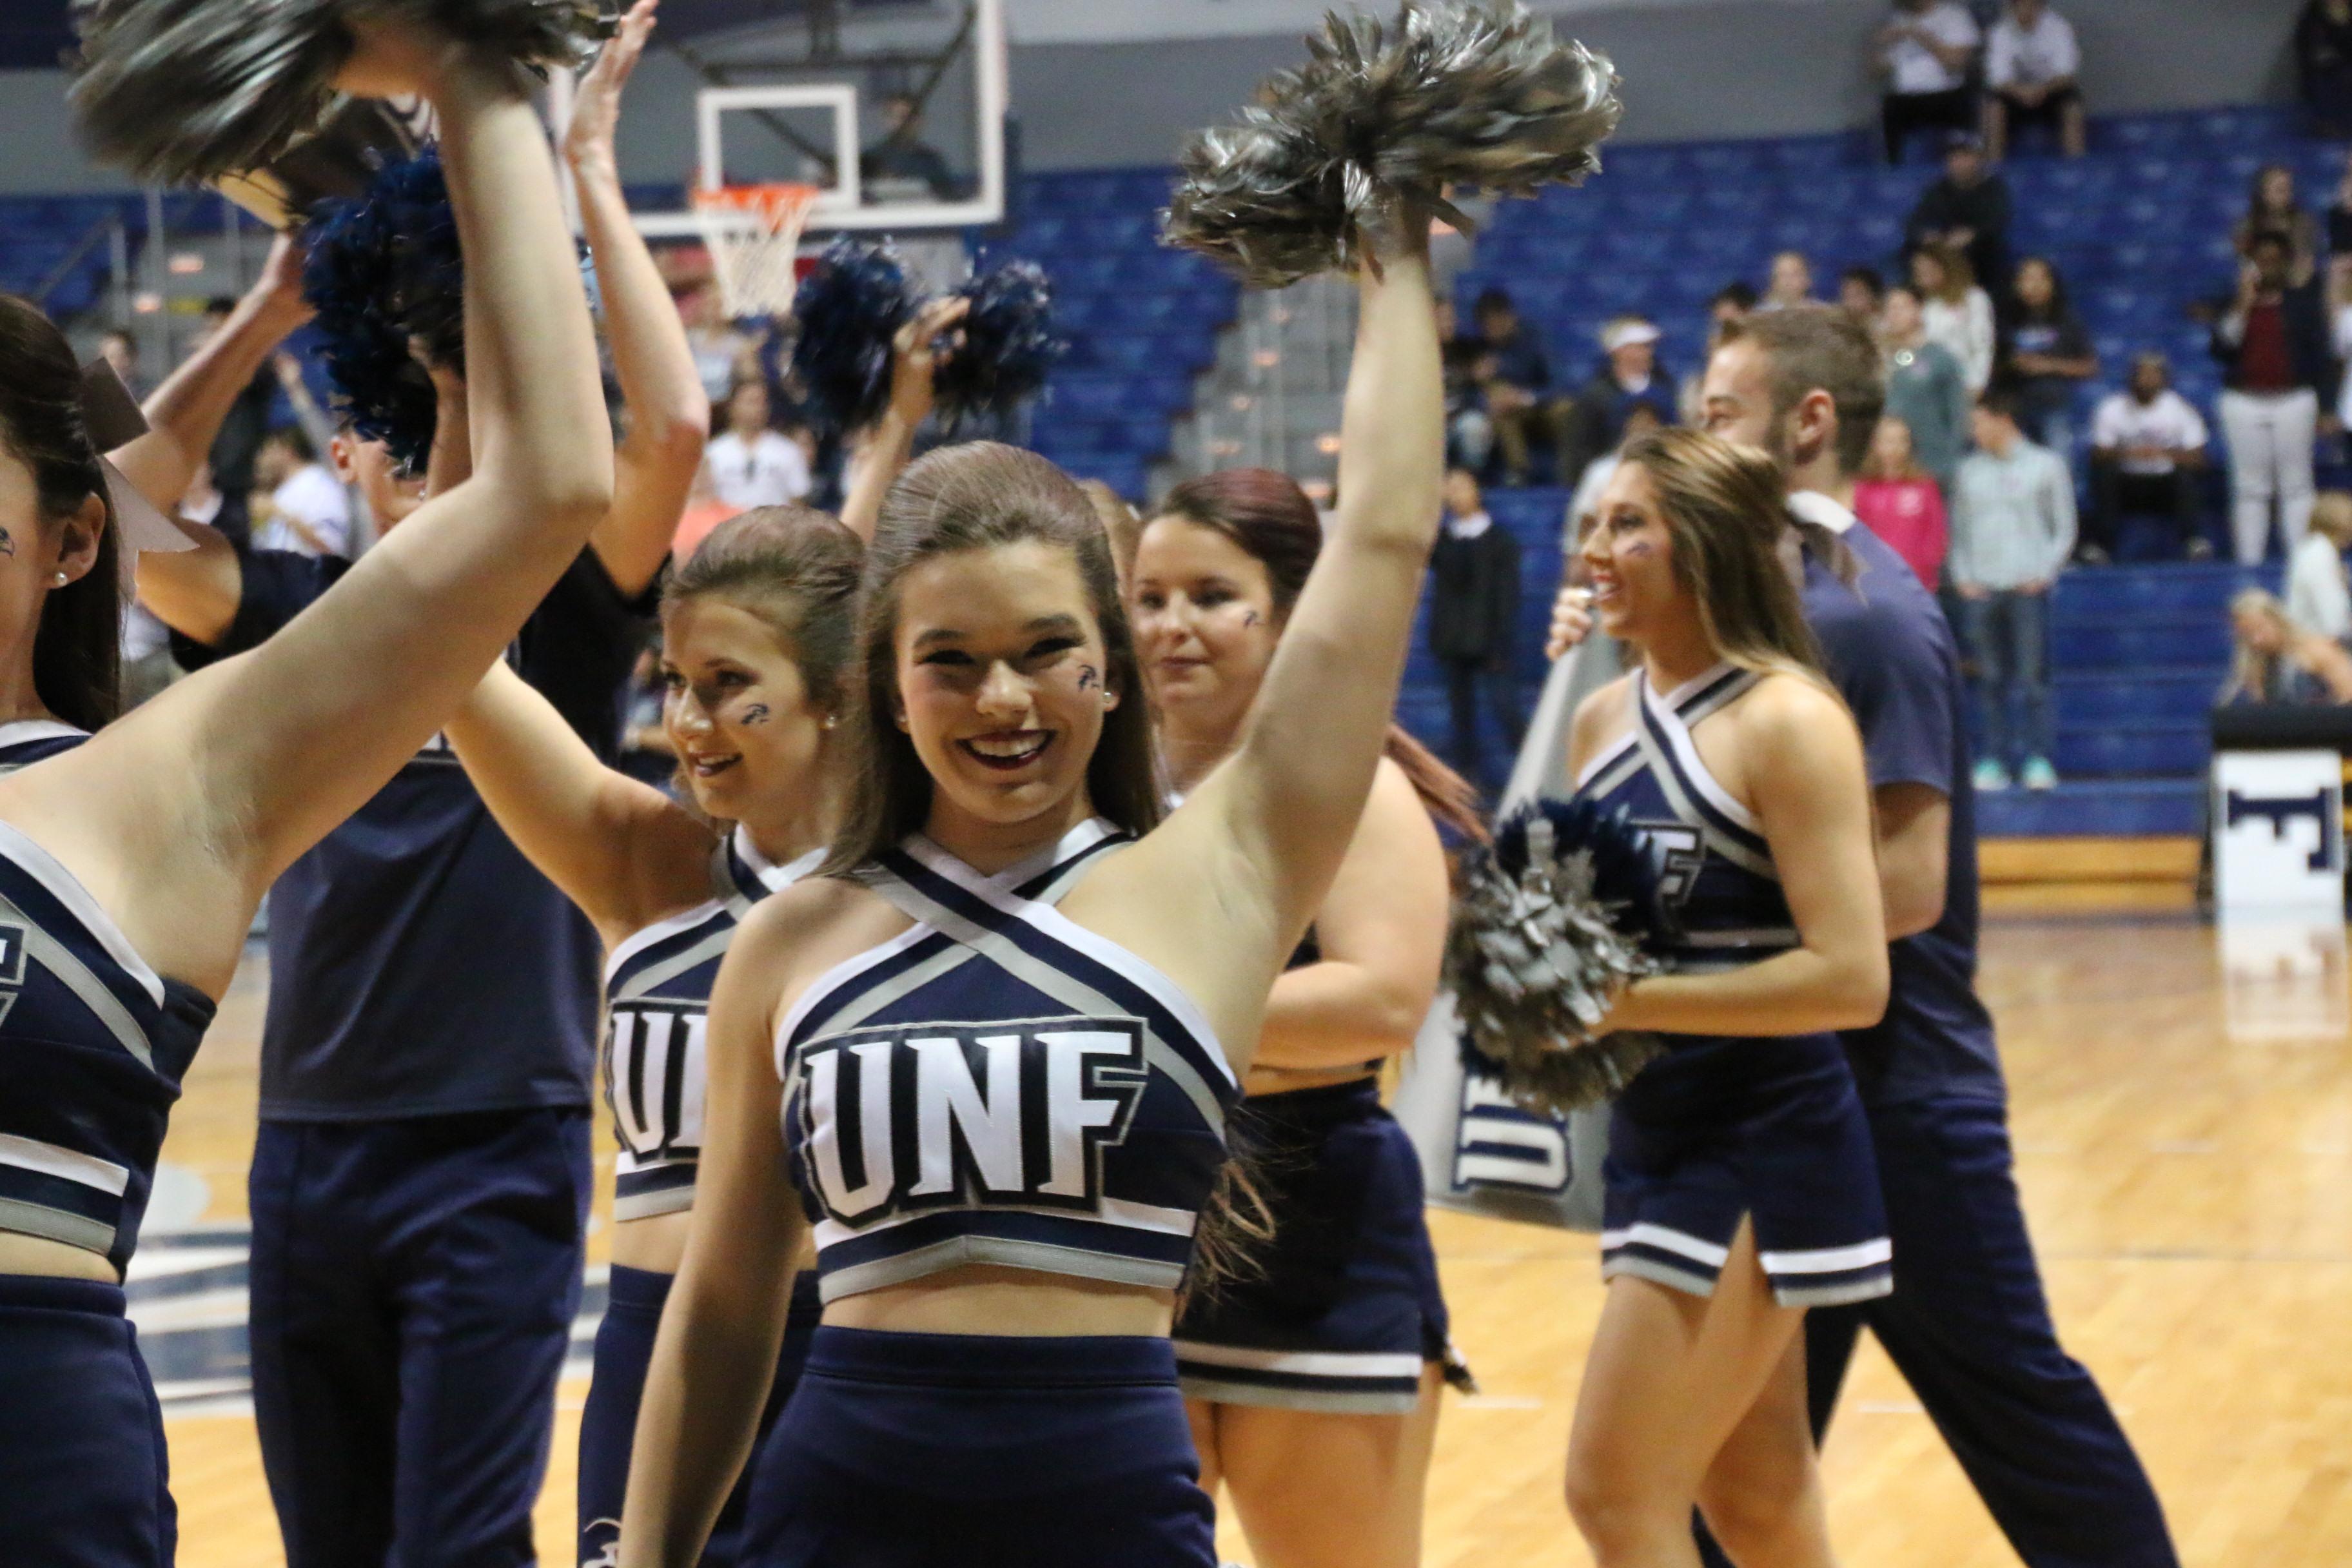 a closer look at unf cheerleading unf spinnaker